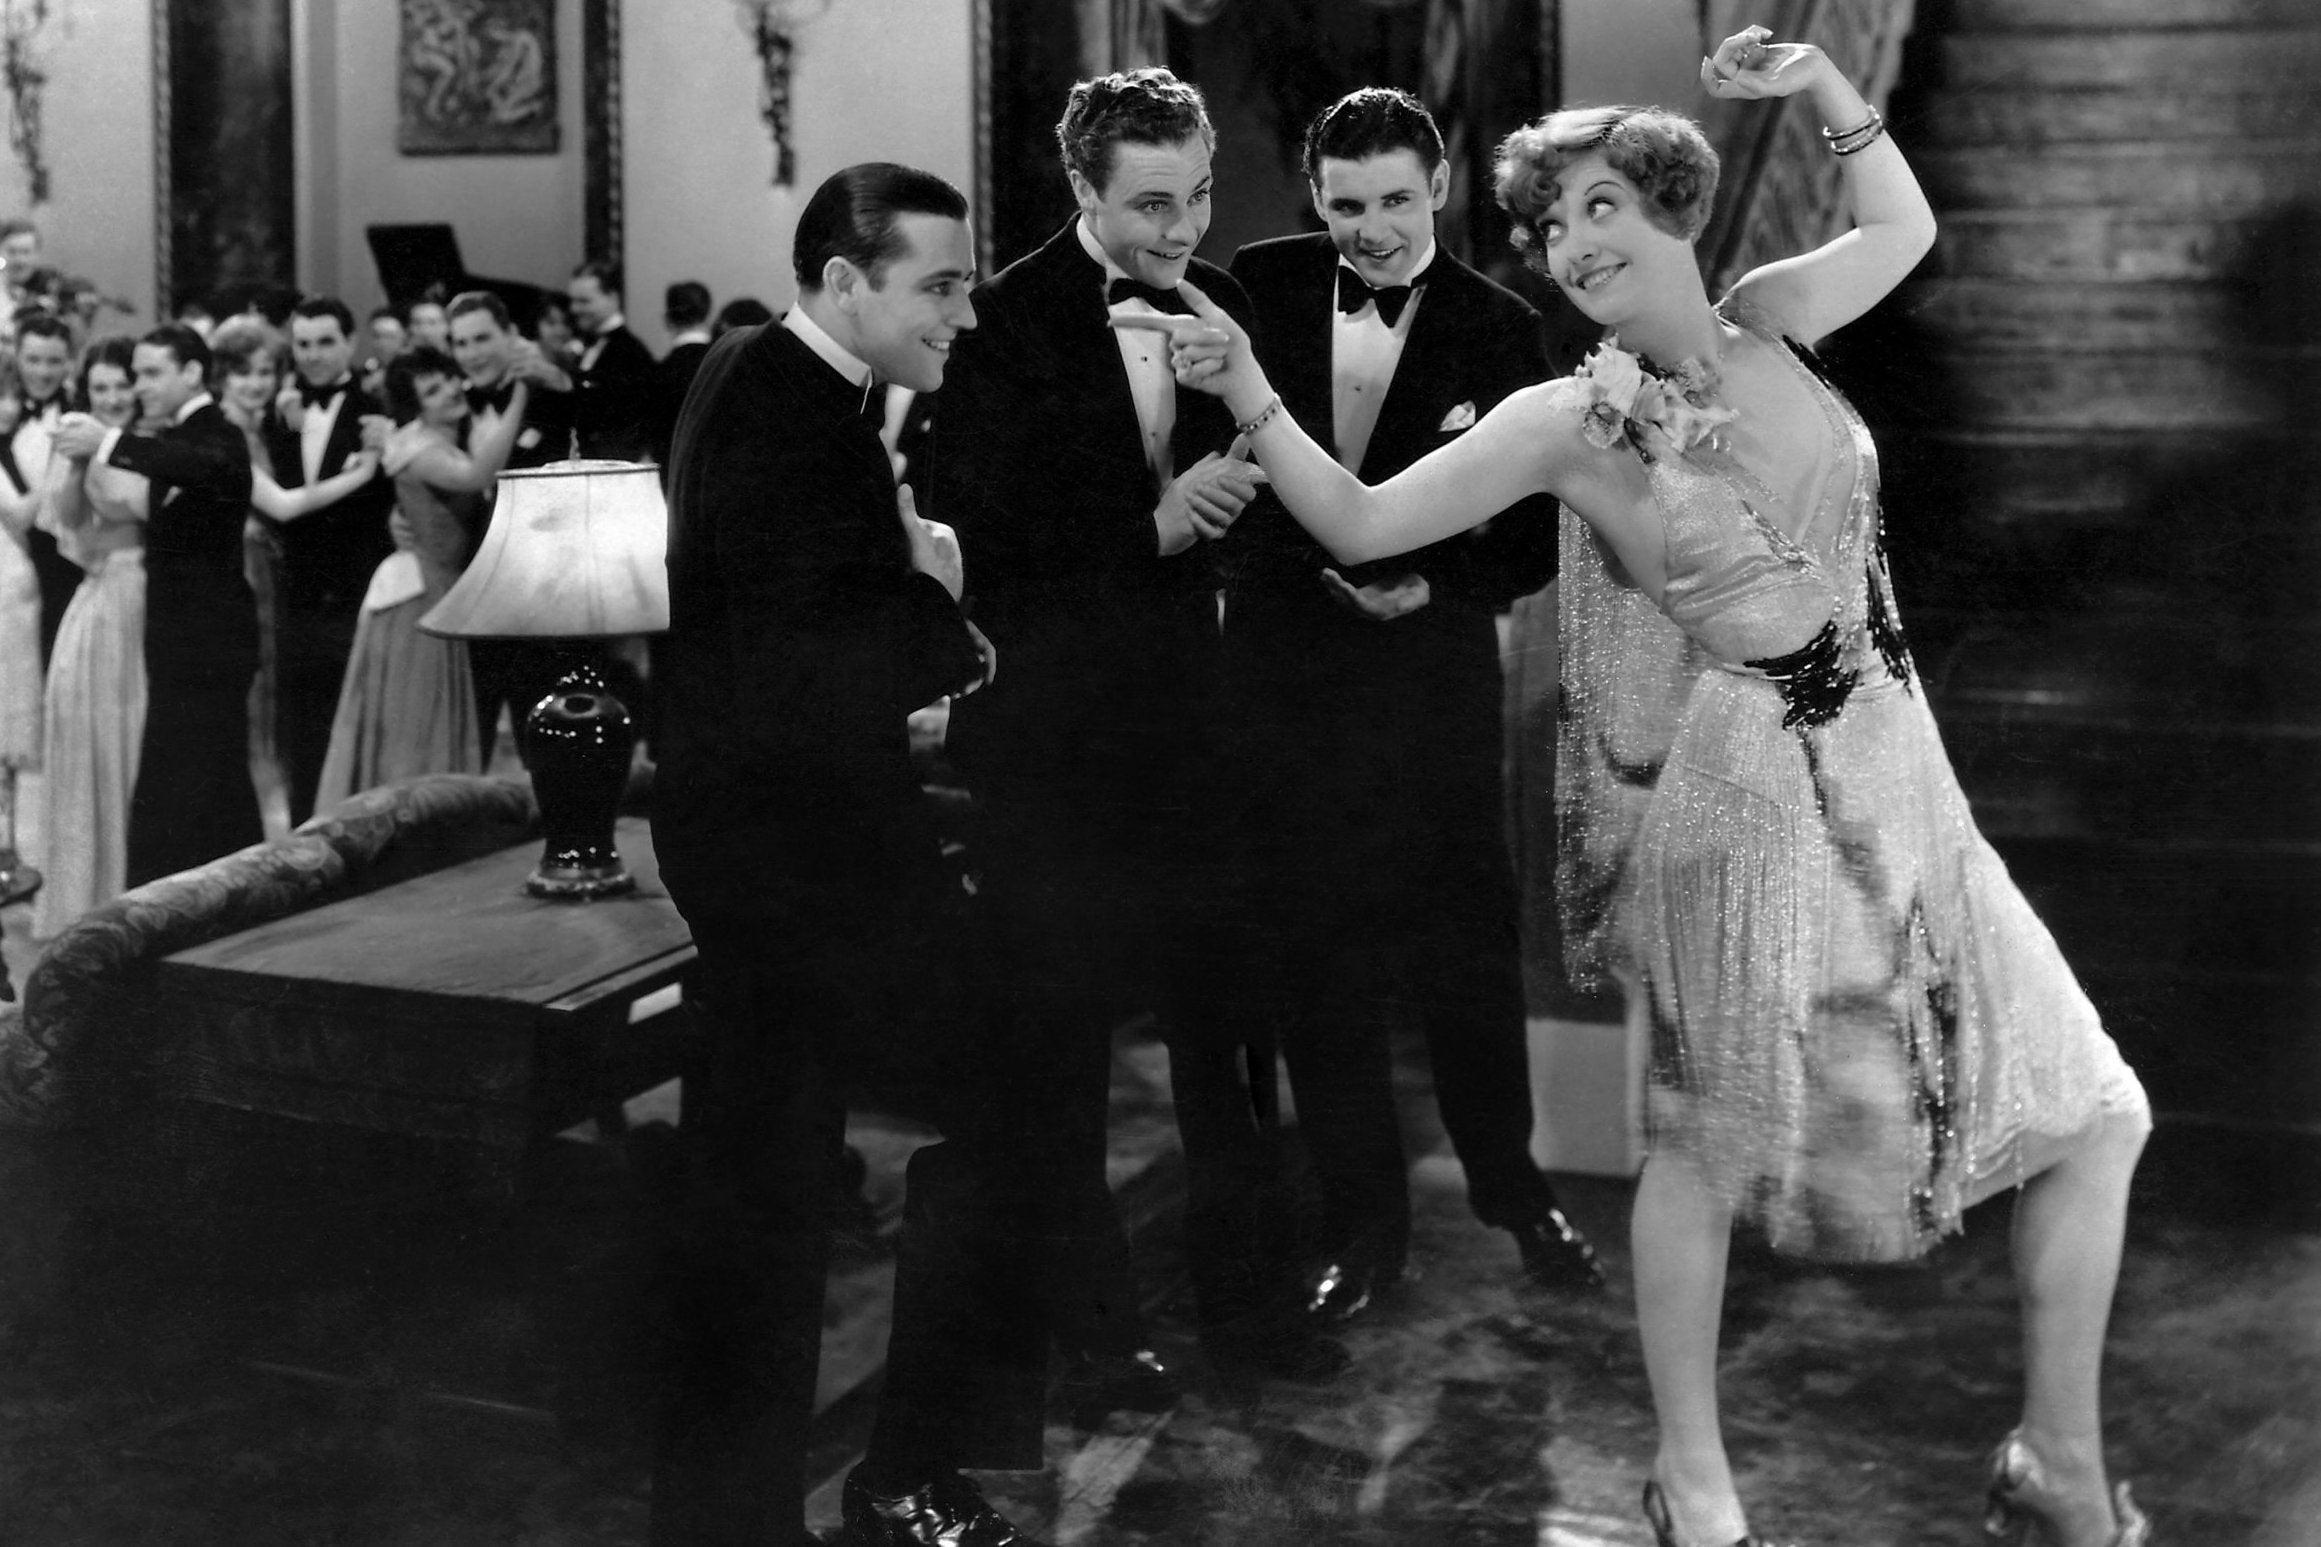 Joan Crawford Last Public Appearance